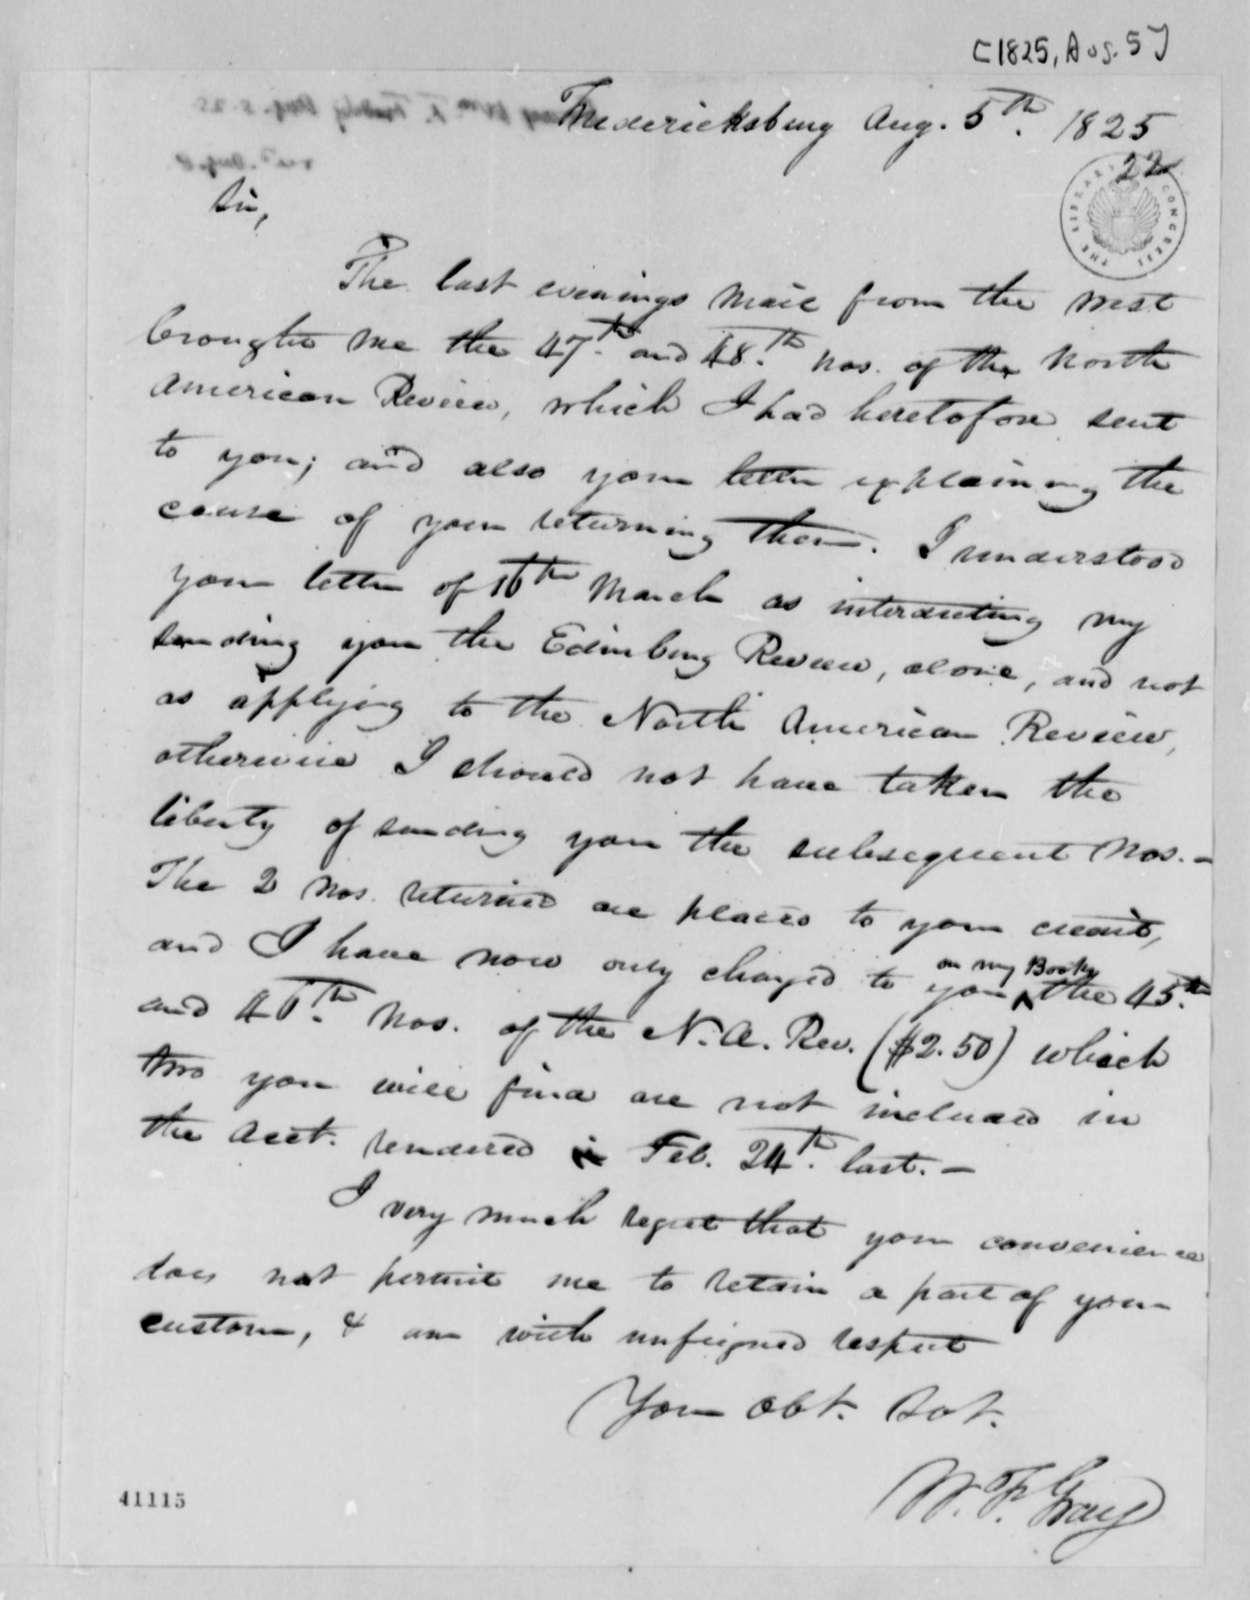 William F. Gray to Thomas Jefferson, August 5, 1825